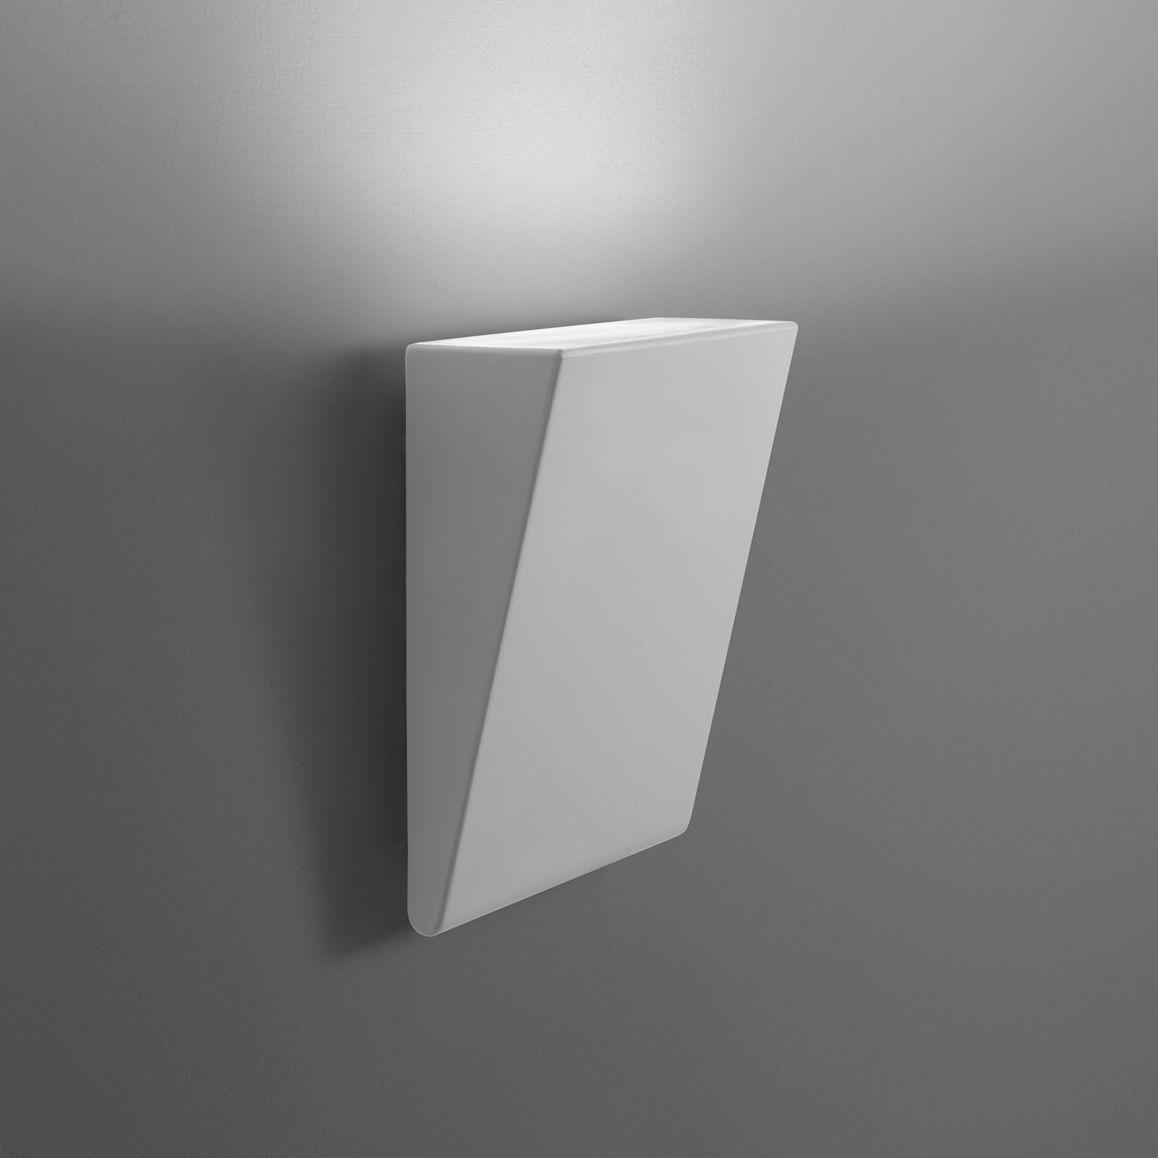 Lighting - Wall Lights - Cuneo Outdoor wall light - / Floor lamp - Outdoor by Artemide - Aluminium - Painted aluminium